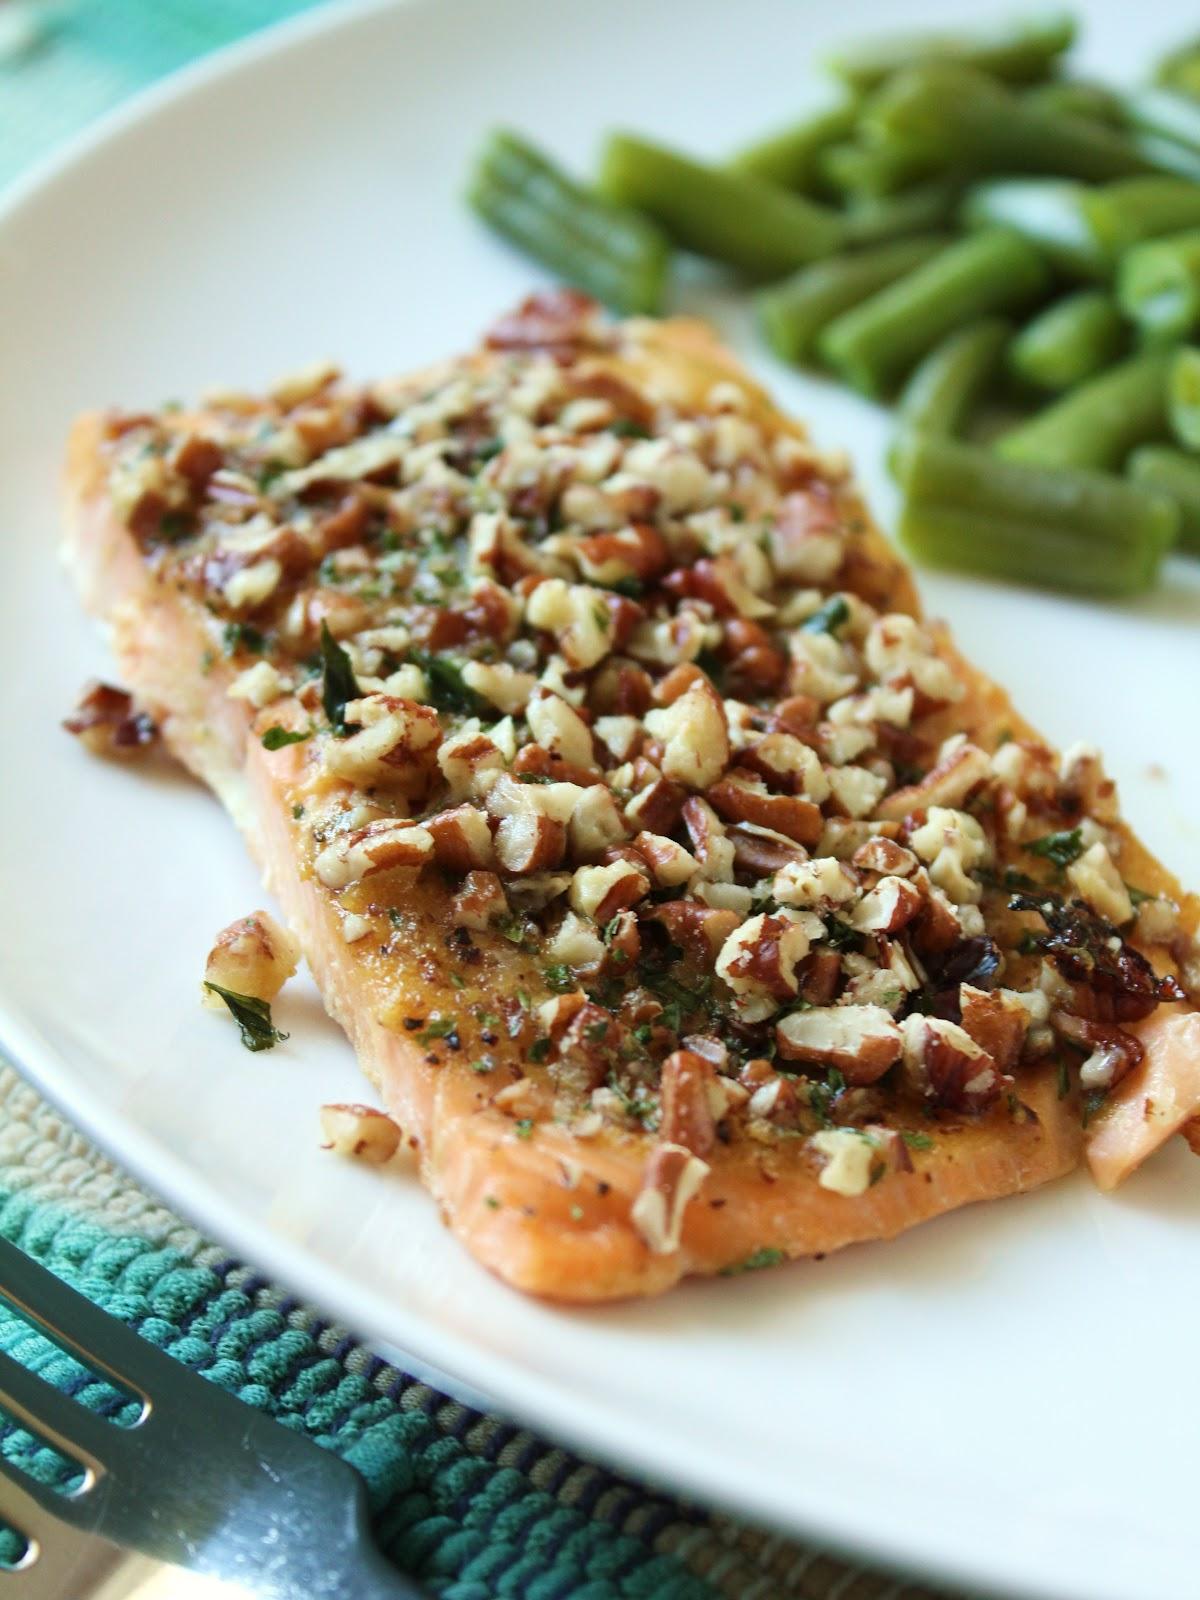 baked dijon salmon recipe yummly baked dijon salmon baked dijon salmon ...